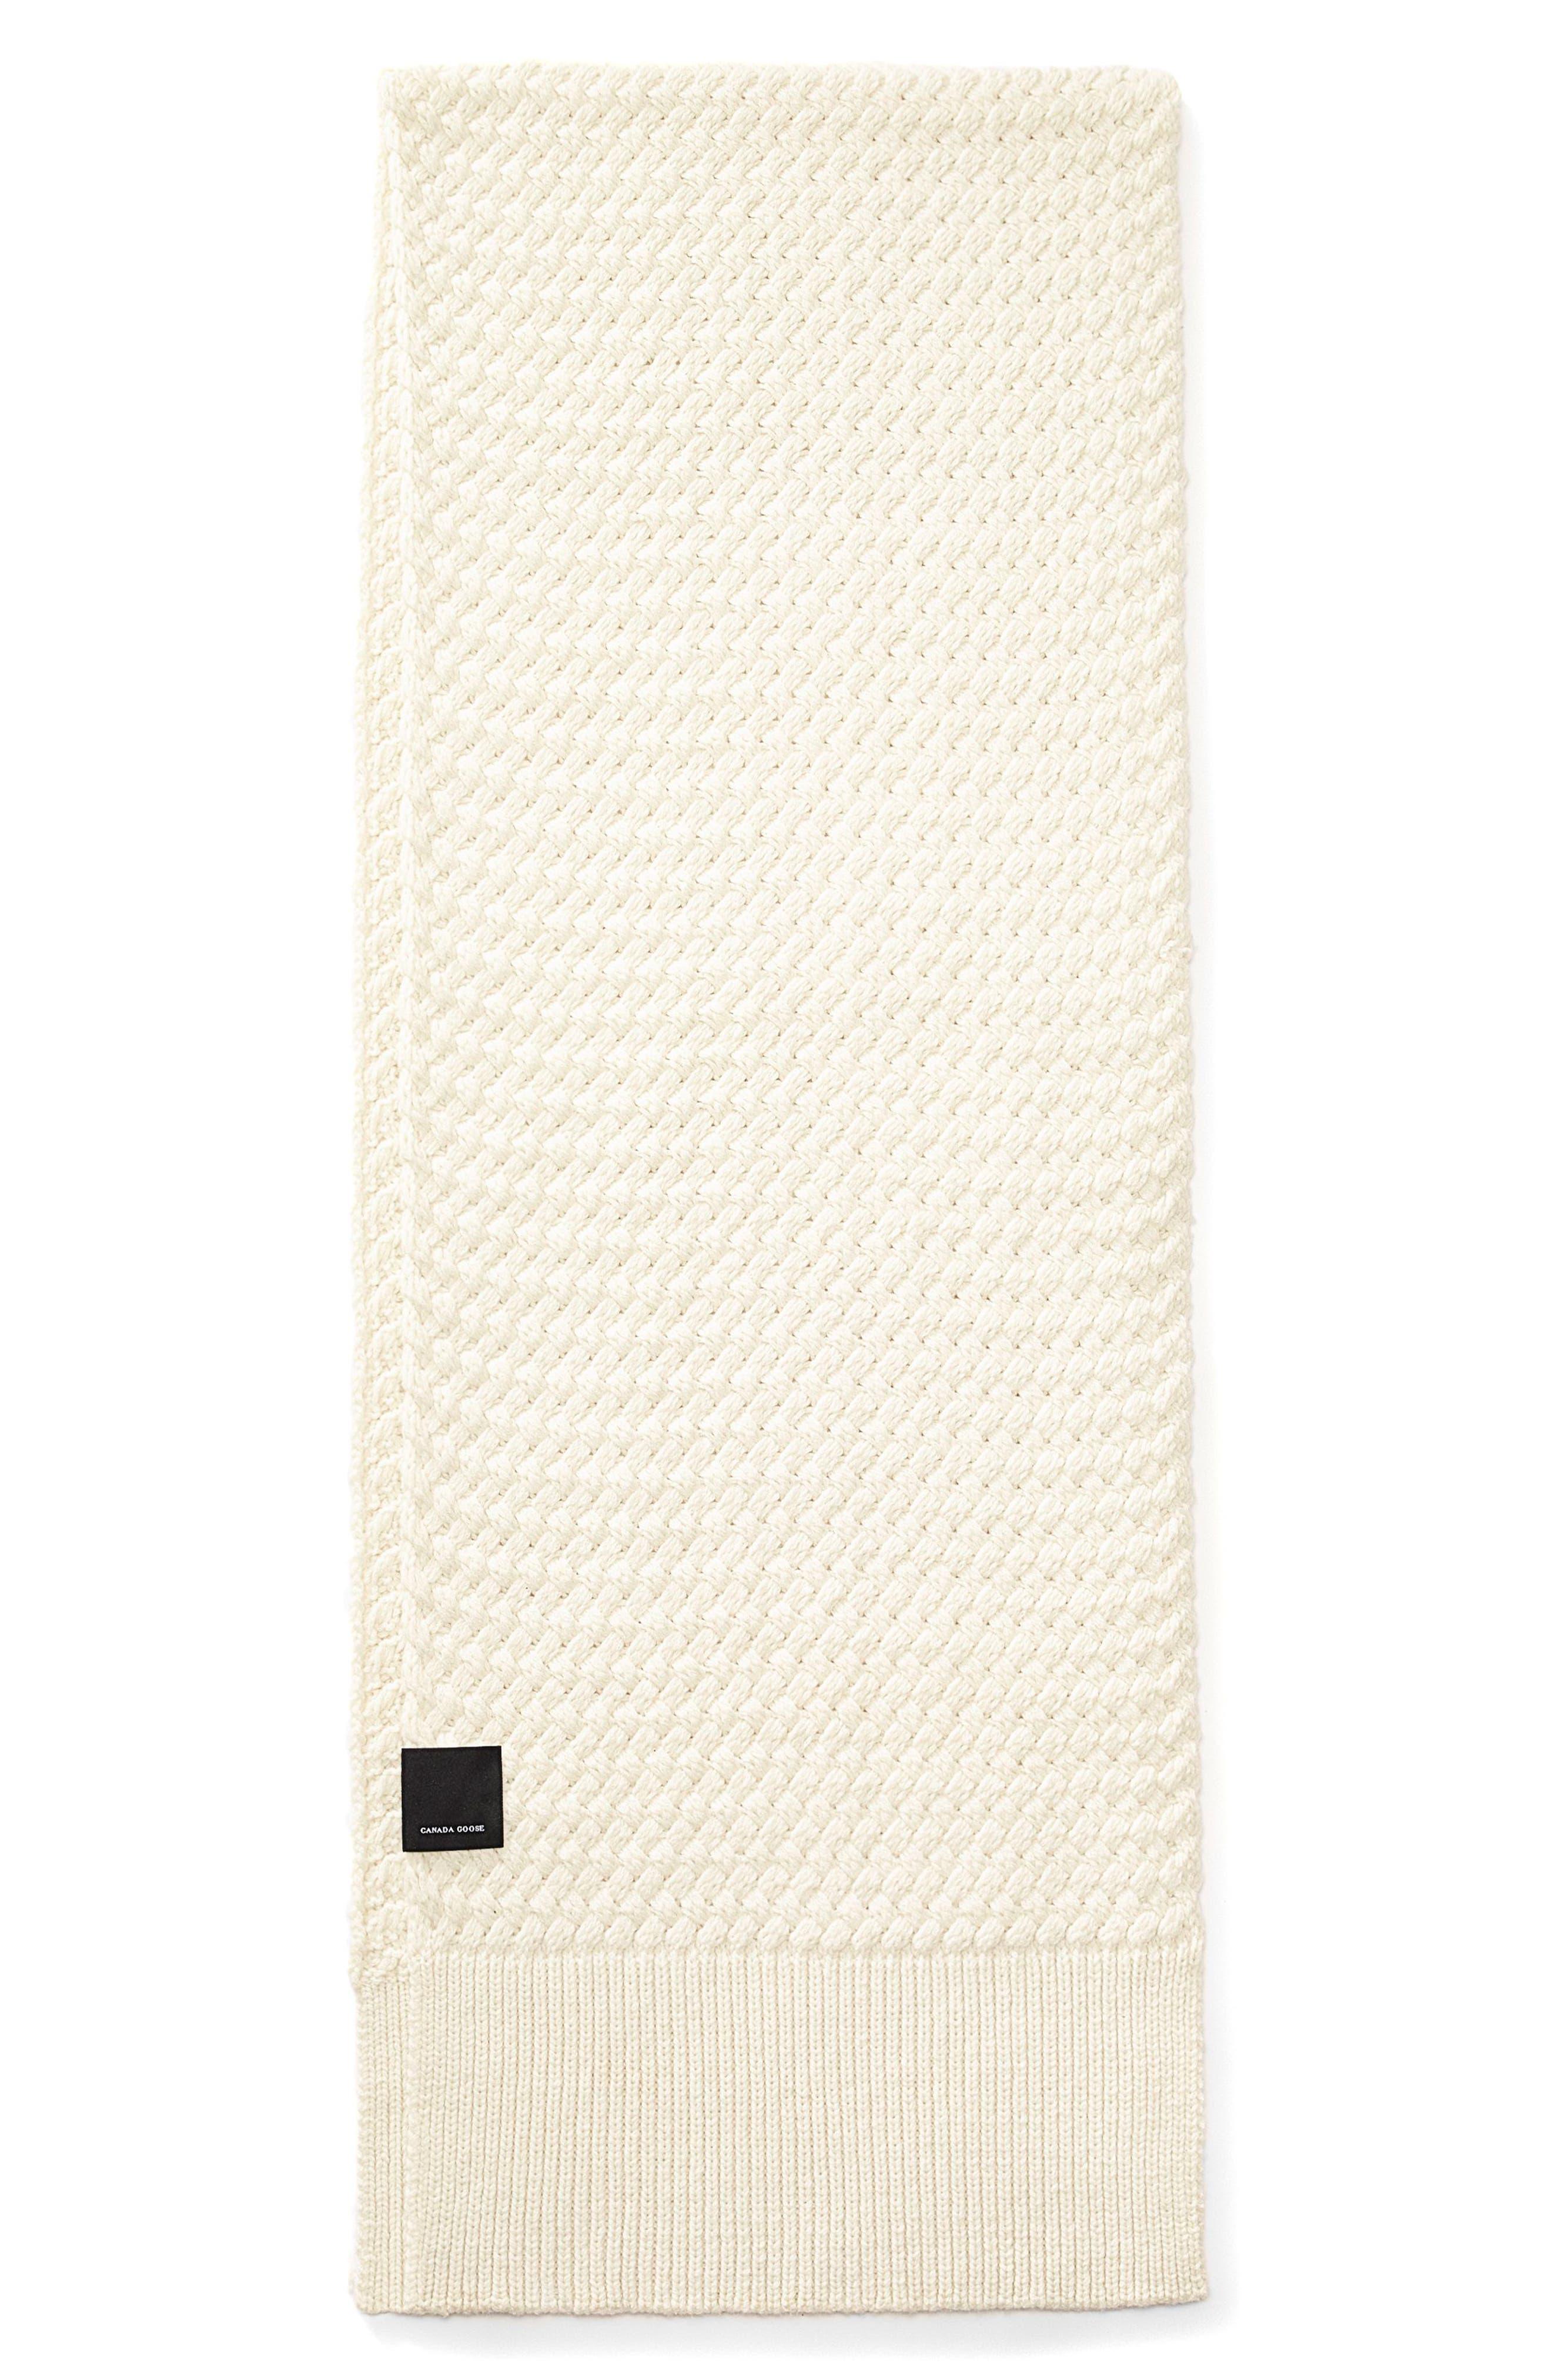 Main Image - Canada Goose Basket Weave Merino Wool Scarf